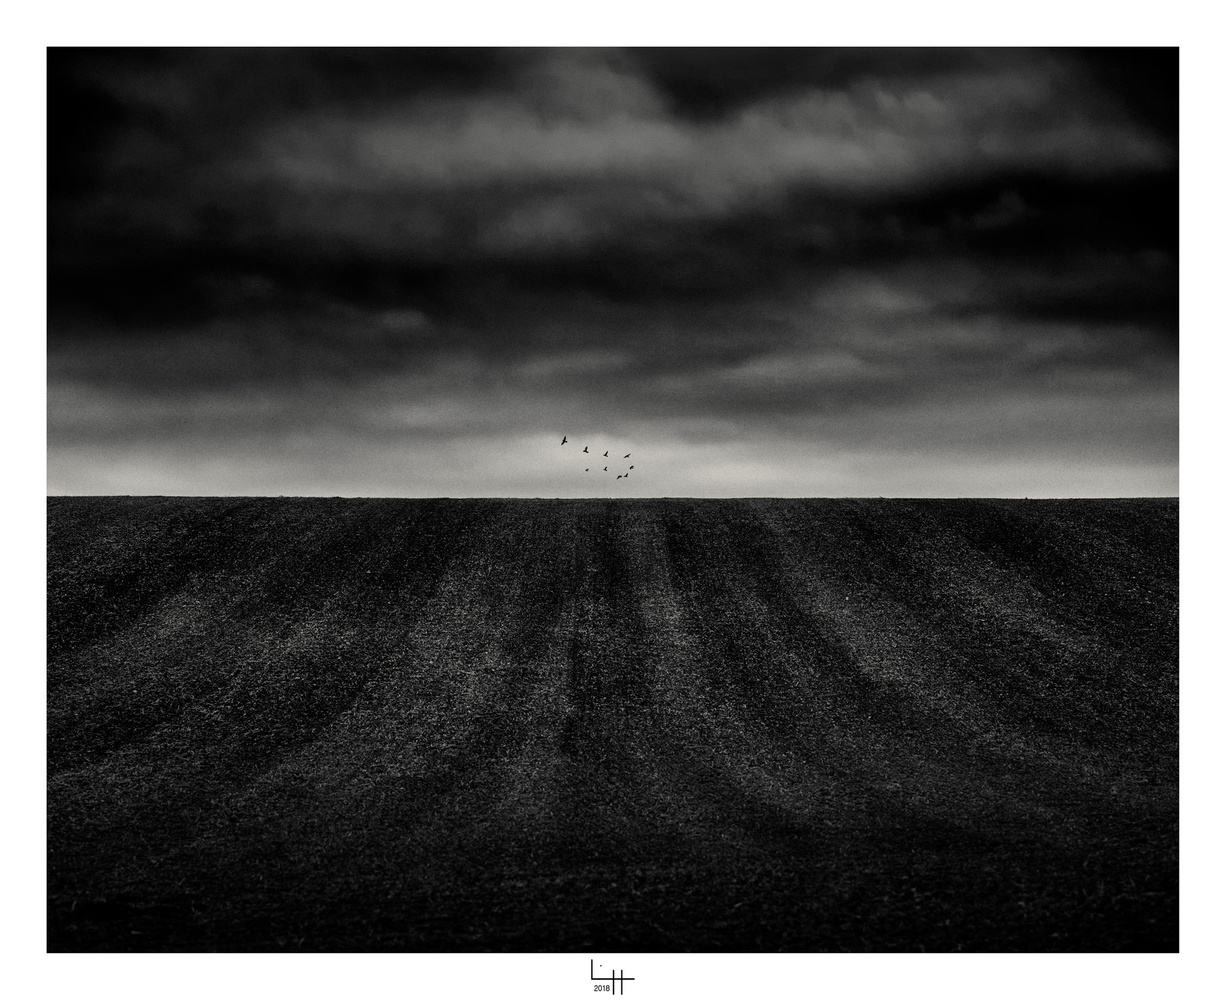 Vols de nuit by Lionel HUG